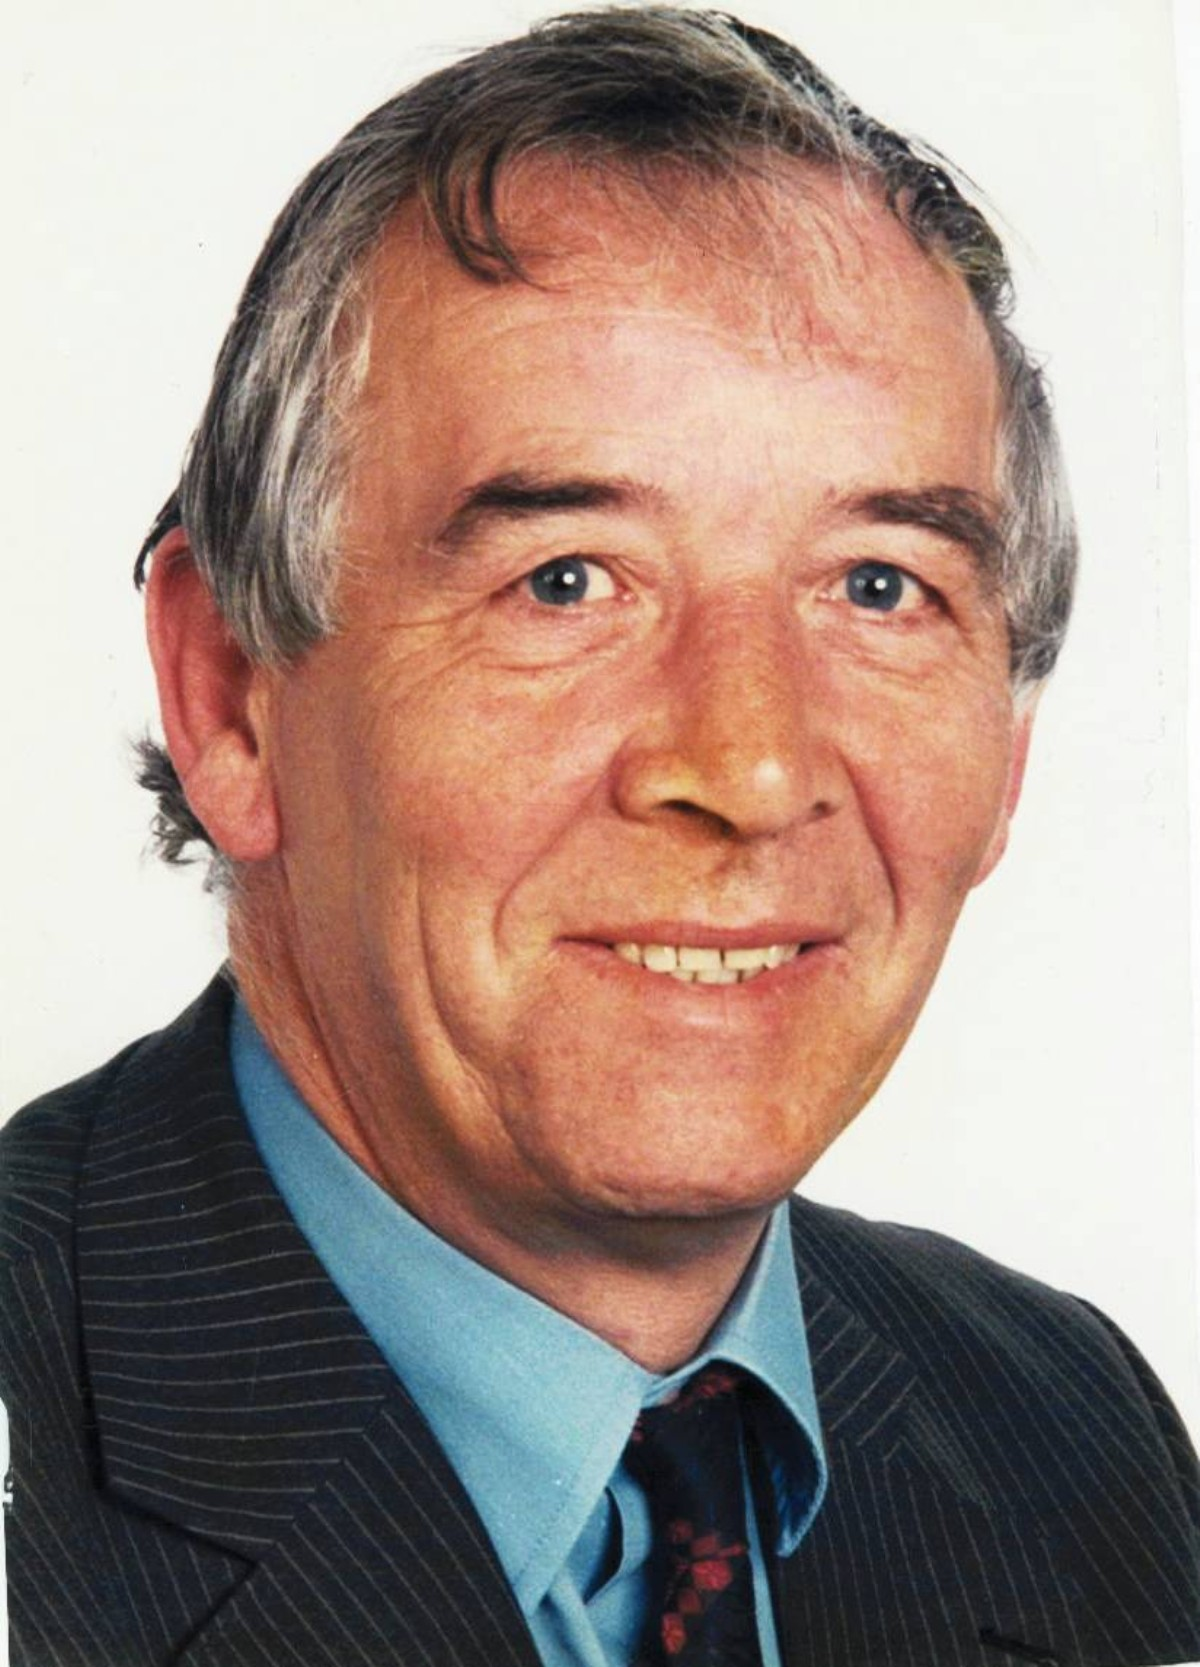 Kevin Allen (born 1959) forecast